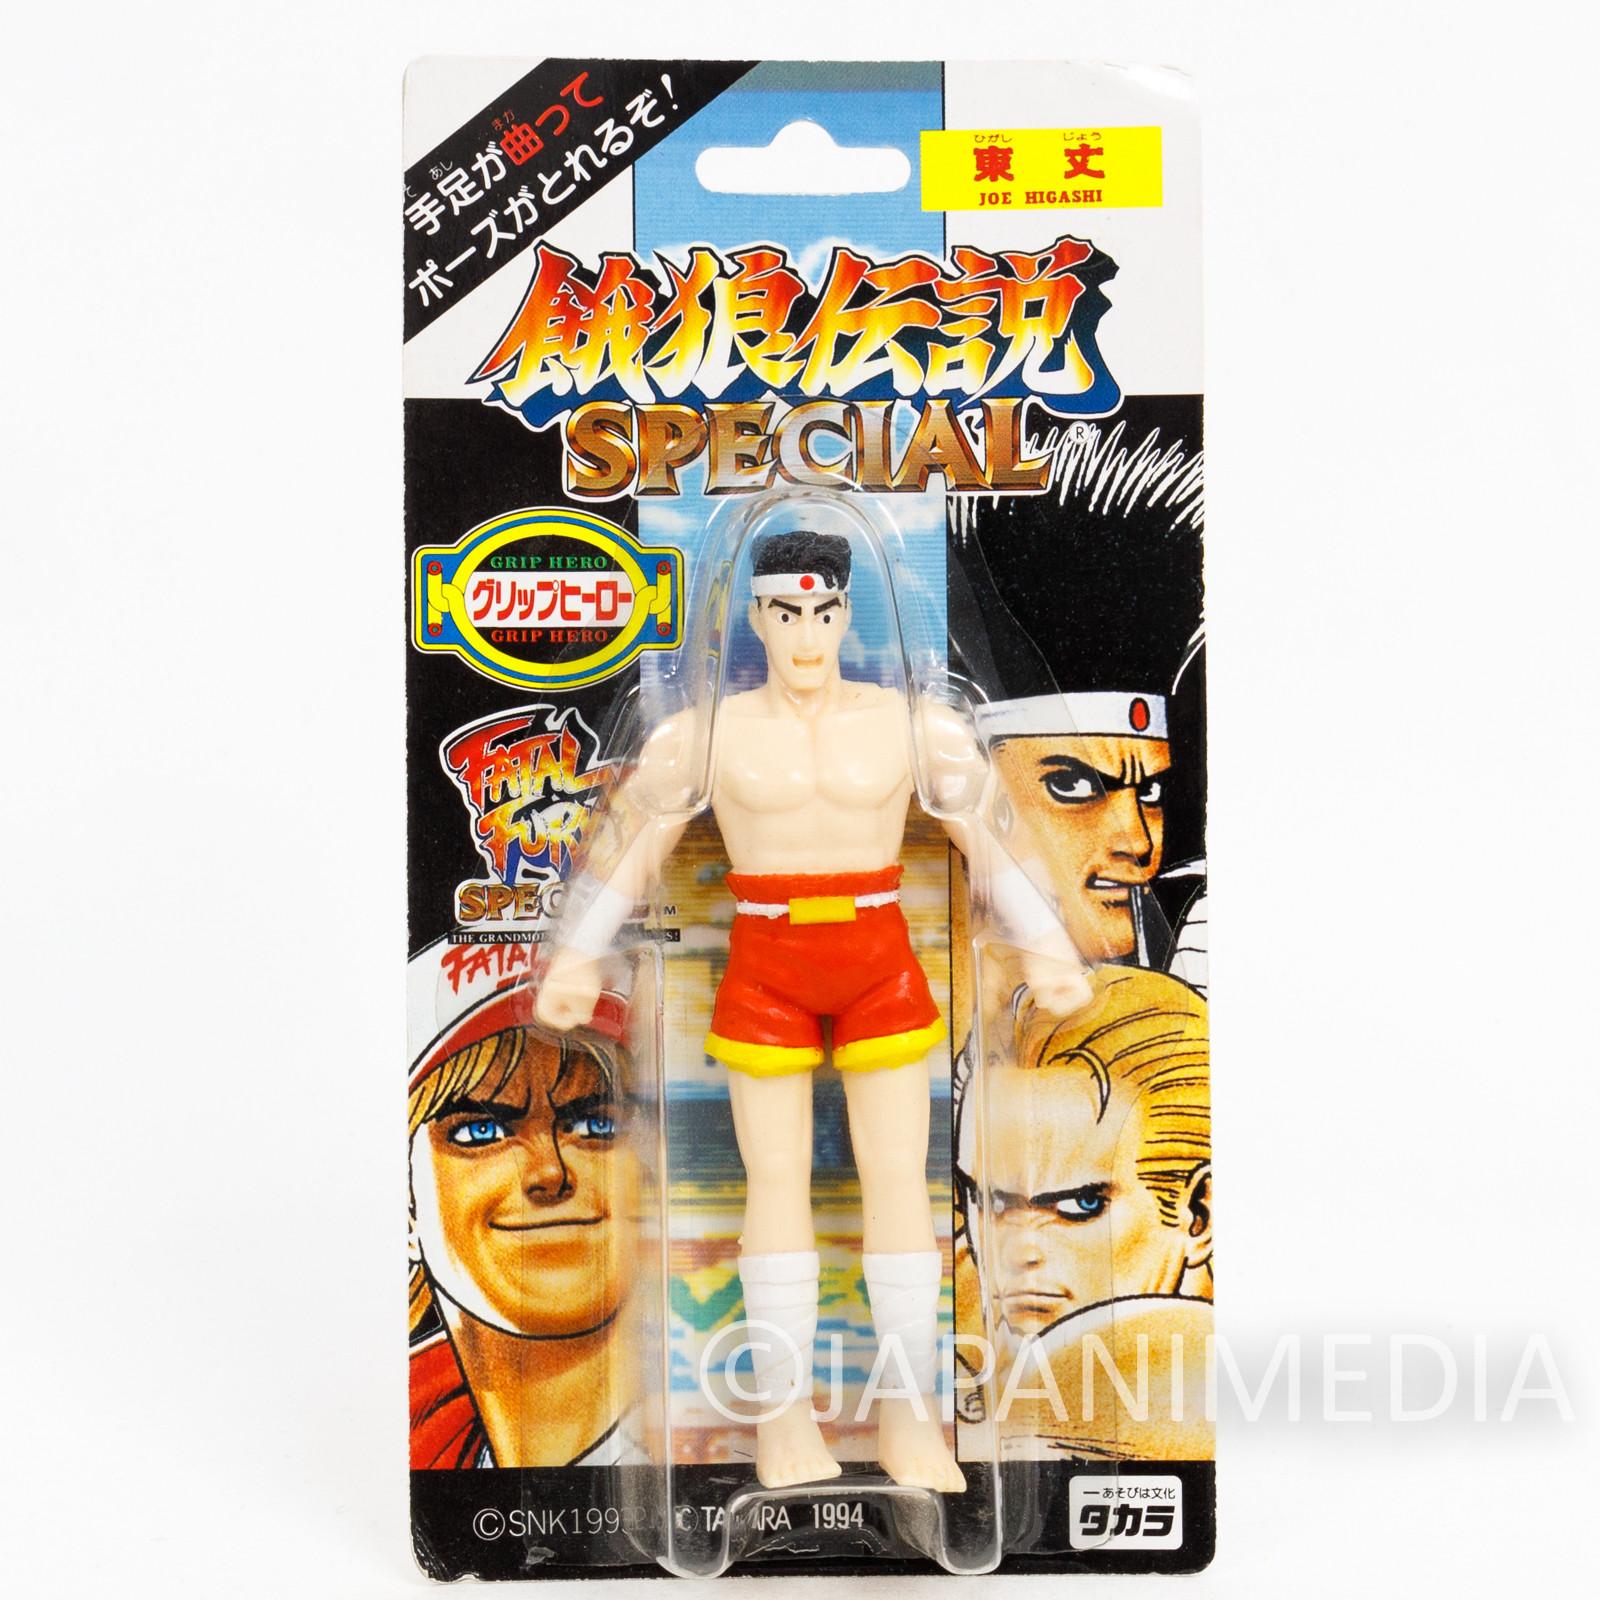 RARE! Fatal Fury Special Joe Higashi Mini Action Figure Grip Hero SNK JAPAN